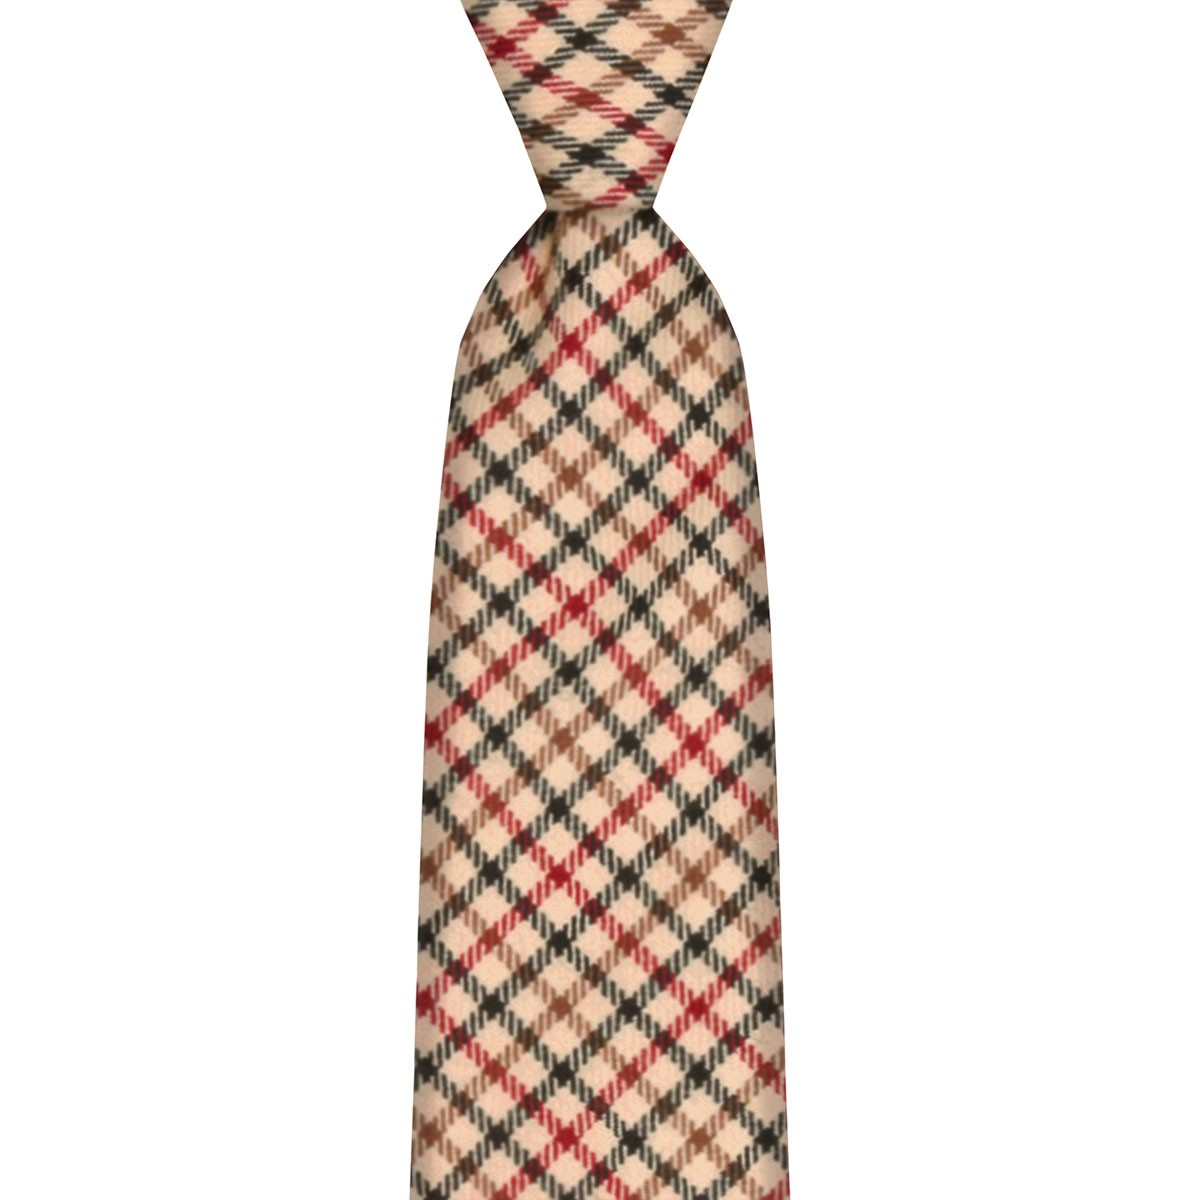 Maxton Check Tweed Wool Tie